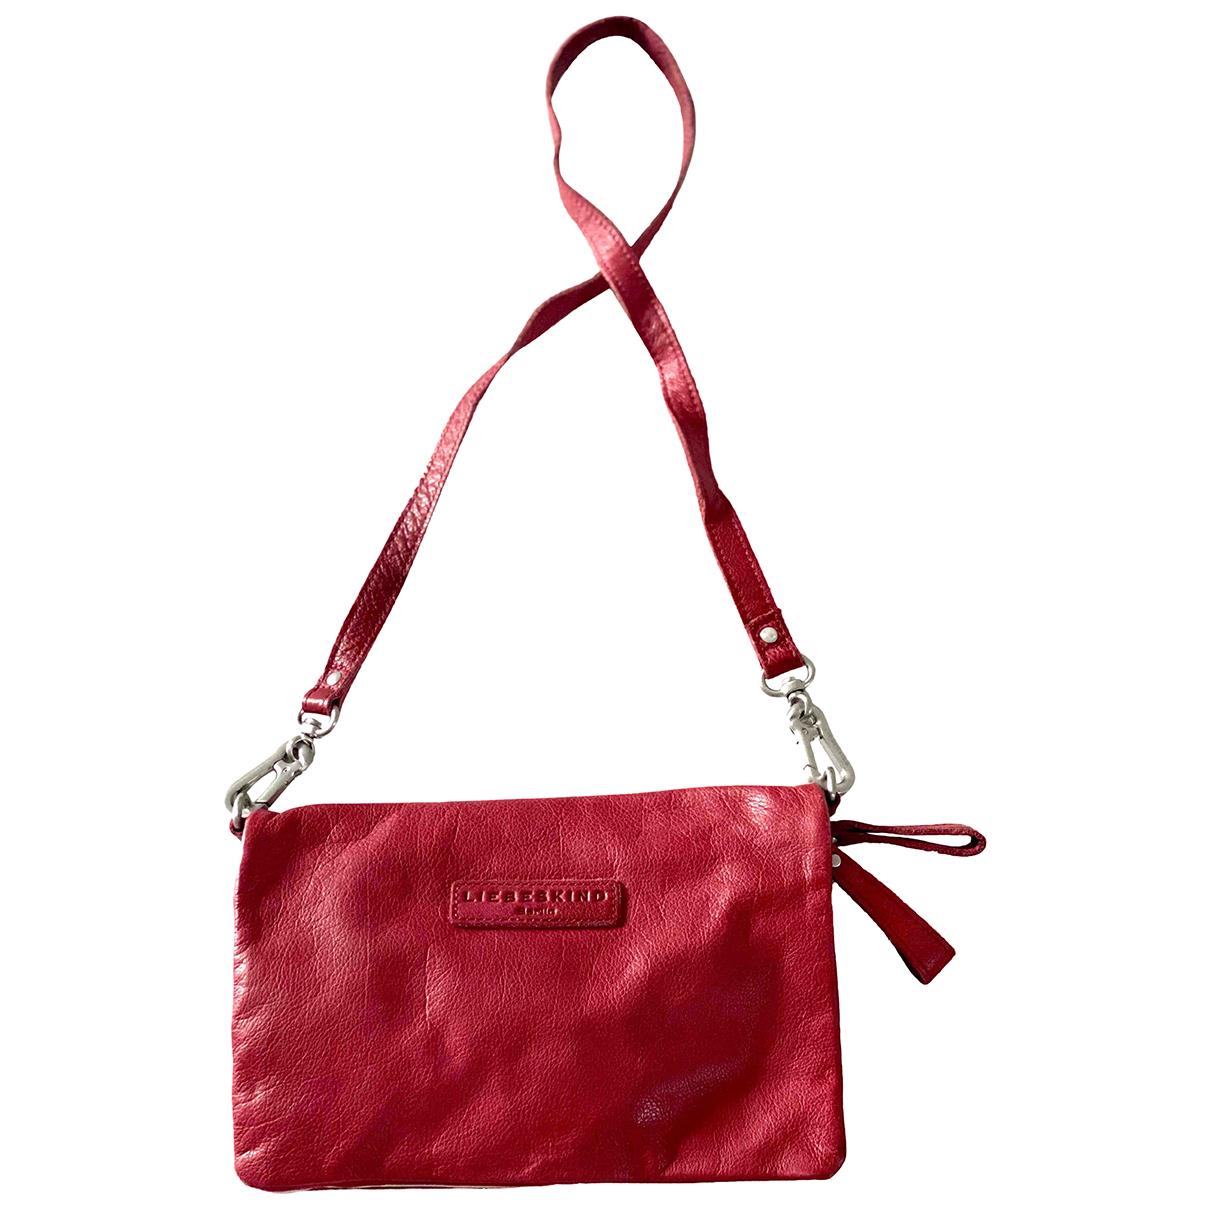 Liebeskind \N Red Leather Clutch bag for Women \N